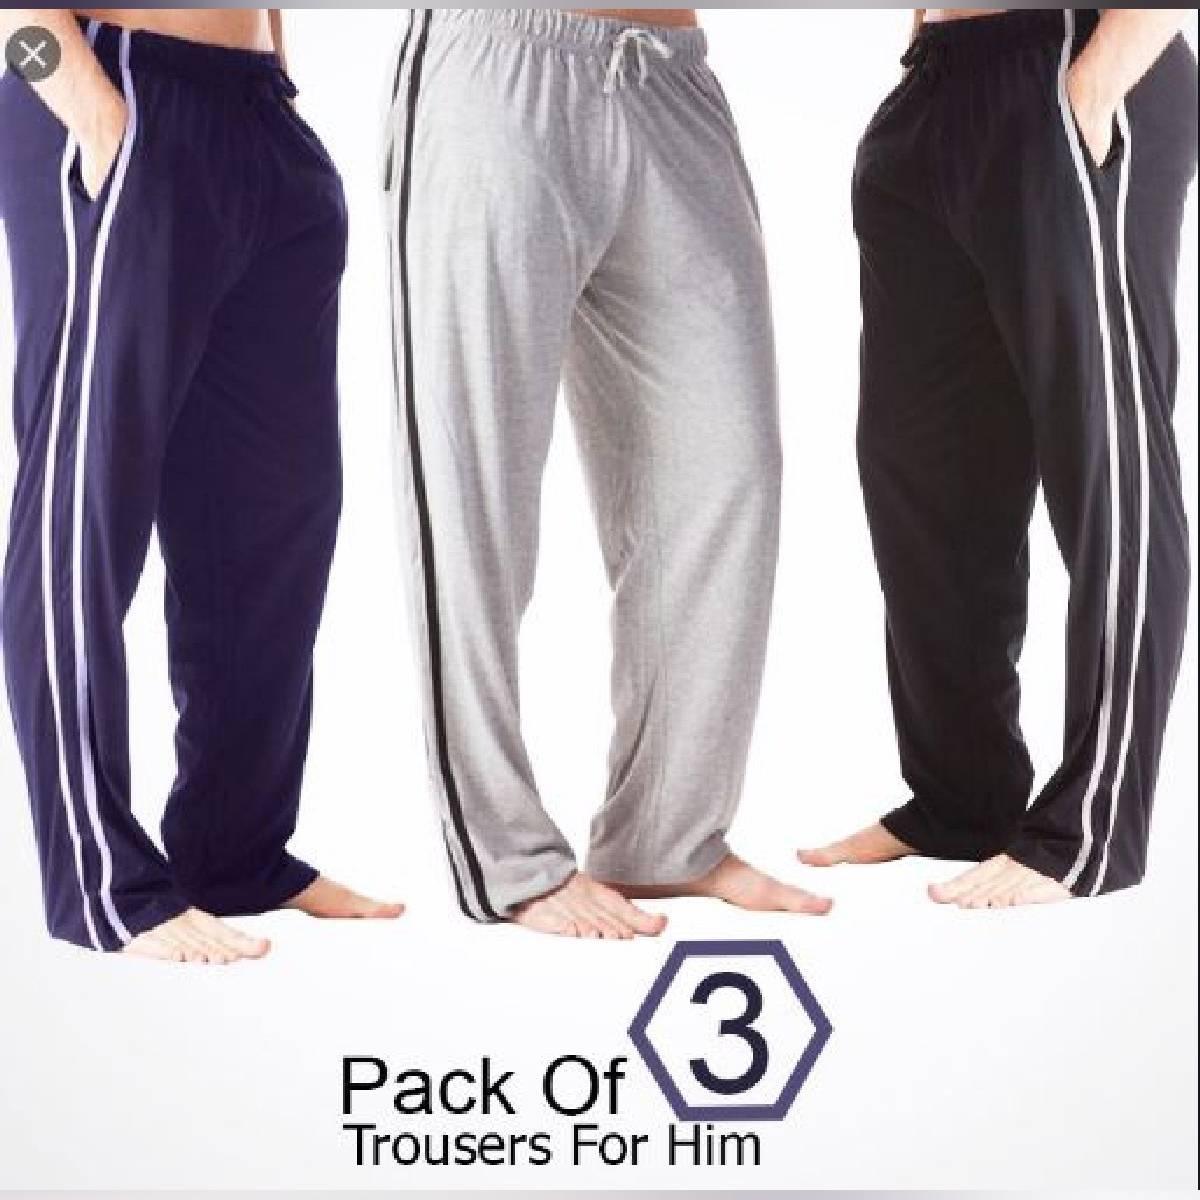 Pack Of 3 New Design Trendy Polyster Trouser For Men Ukcollection